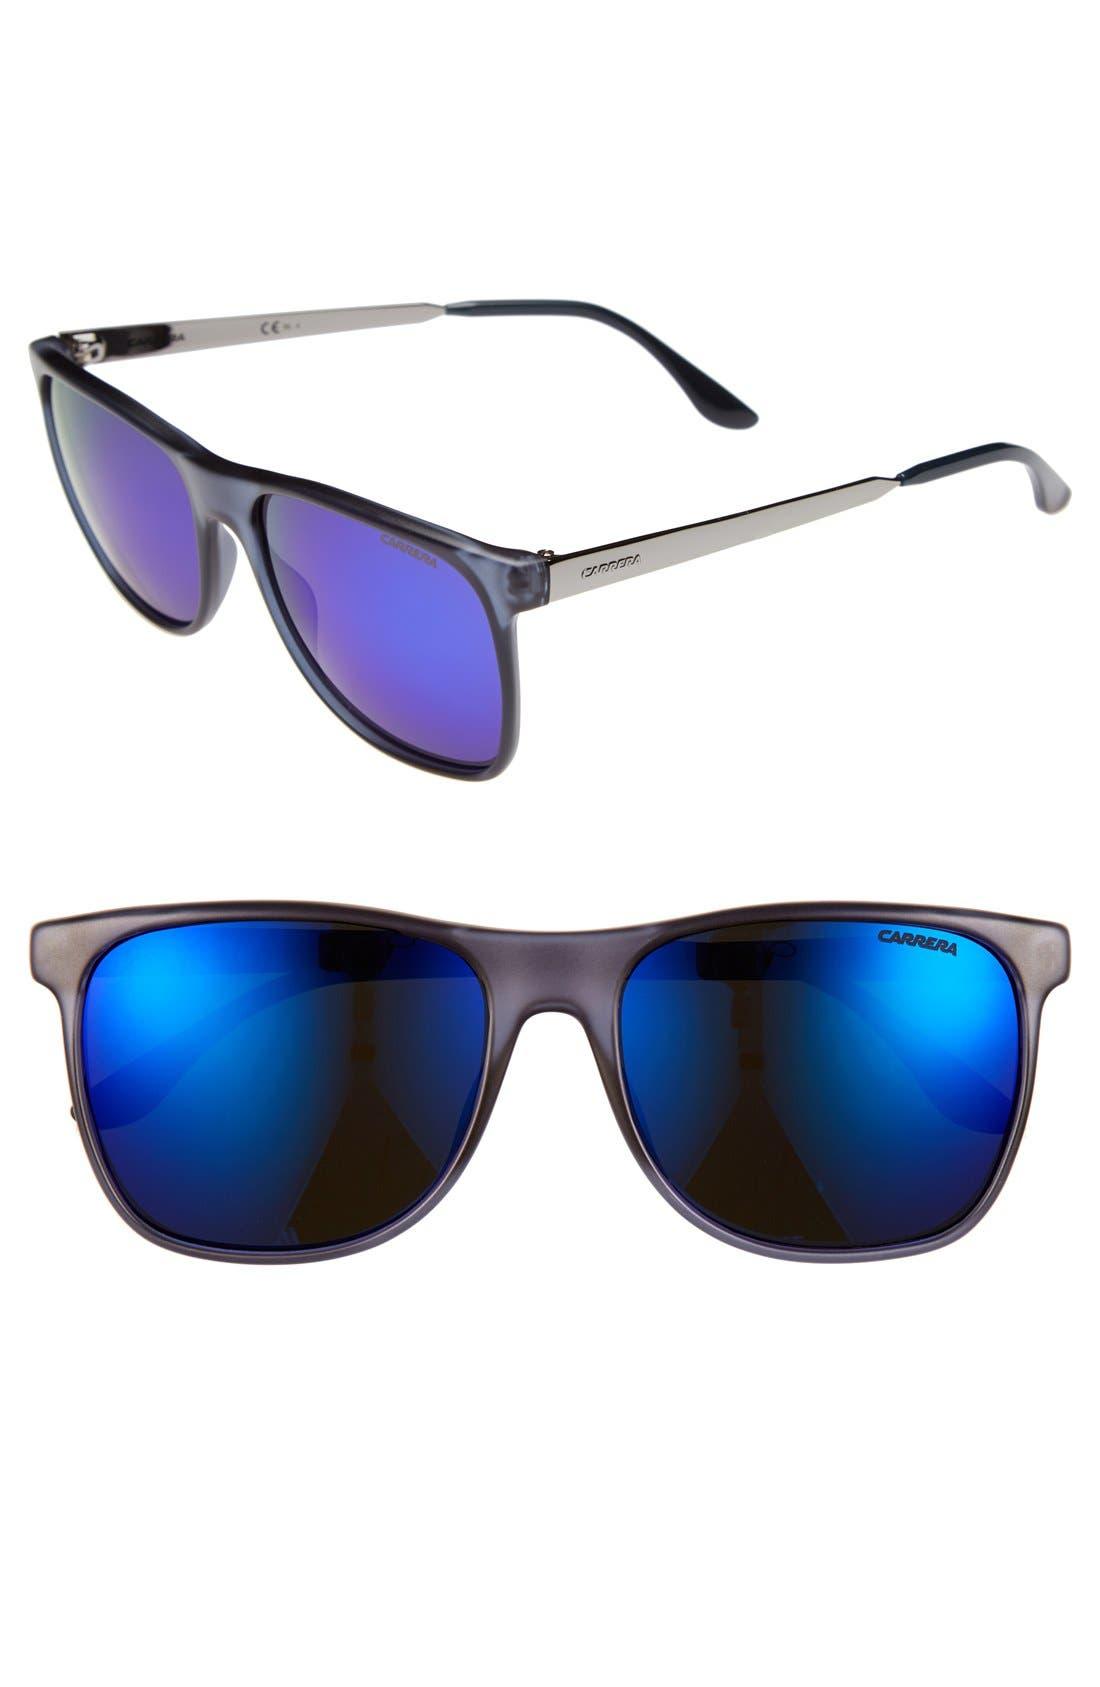 Main Image - Carrera Eyewear 57mm Retro Sunglasses